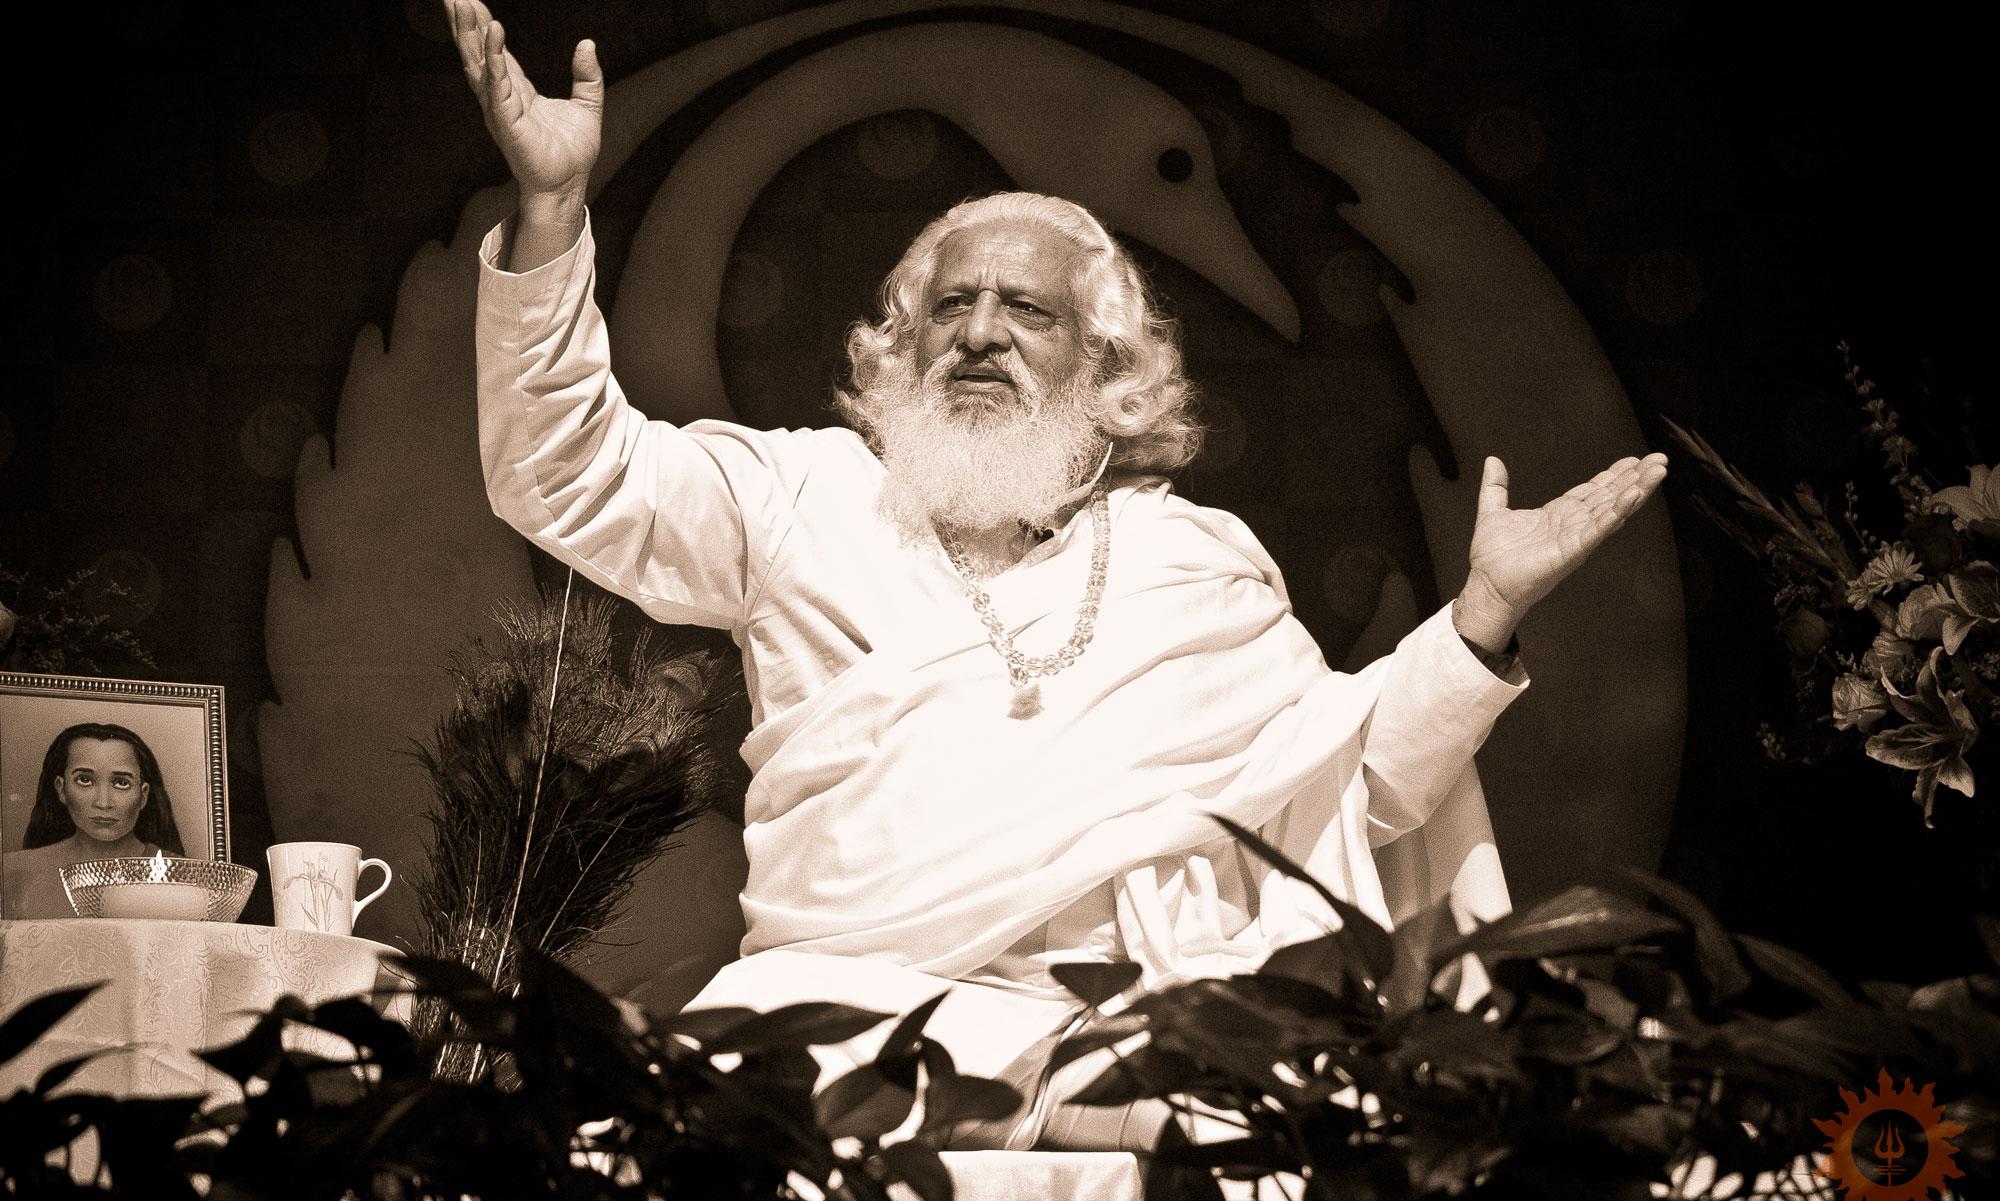 Photograph of Yogiraj.